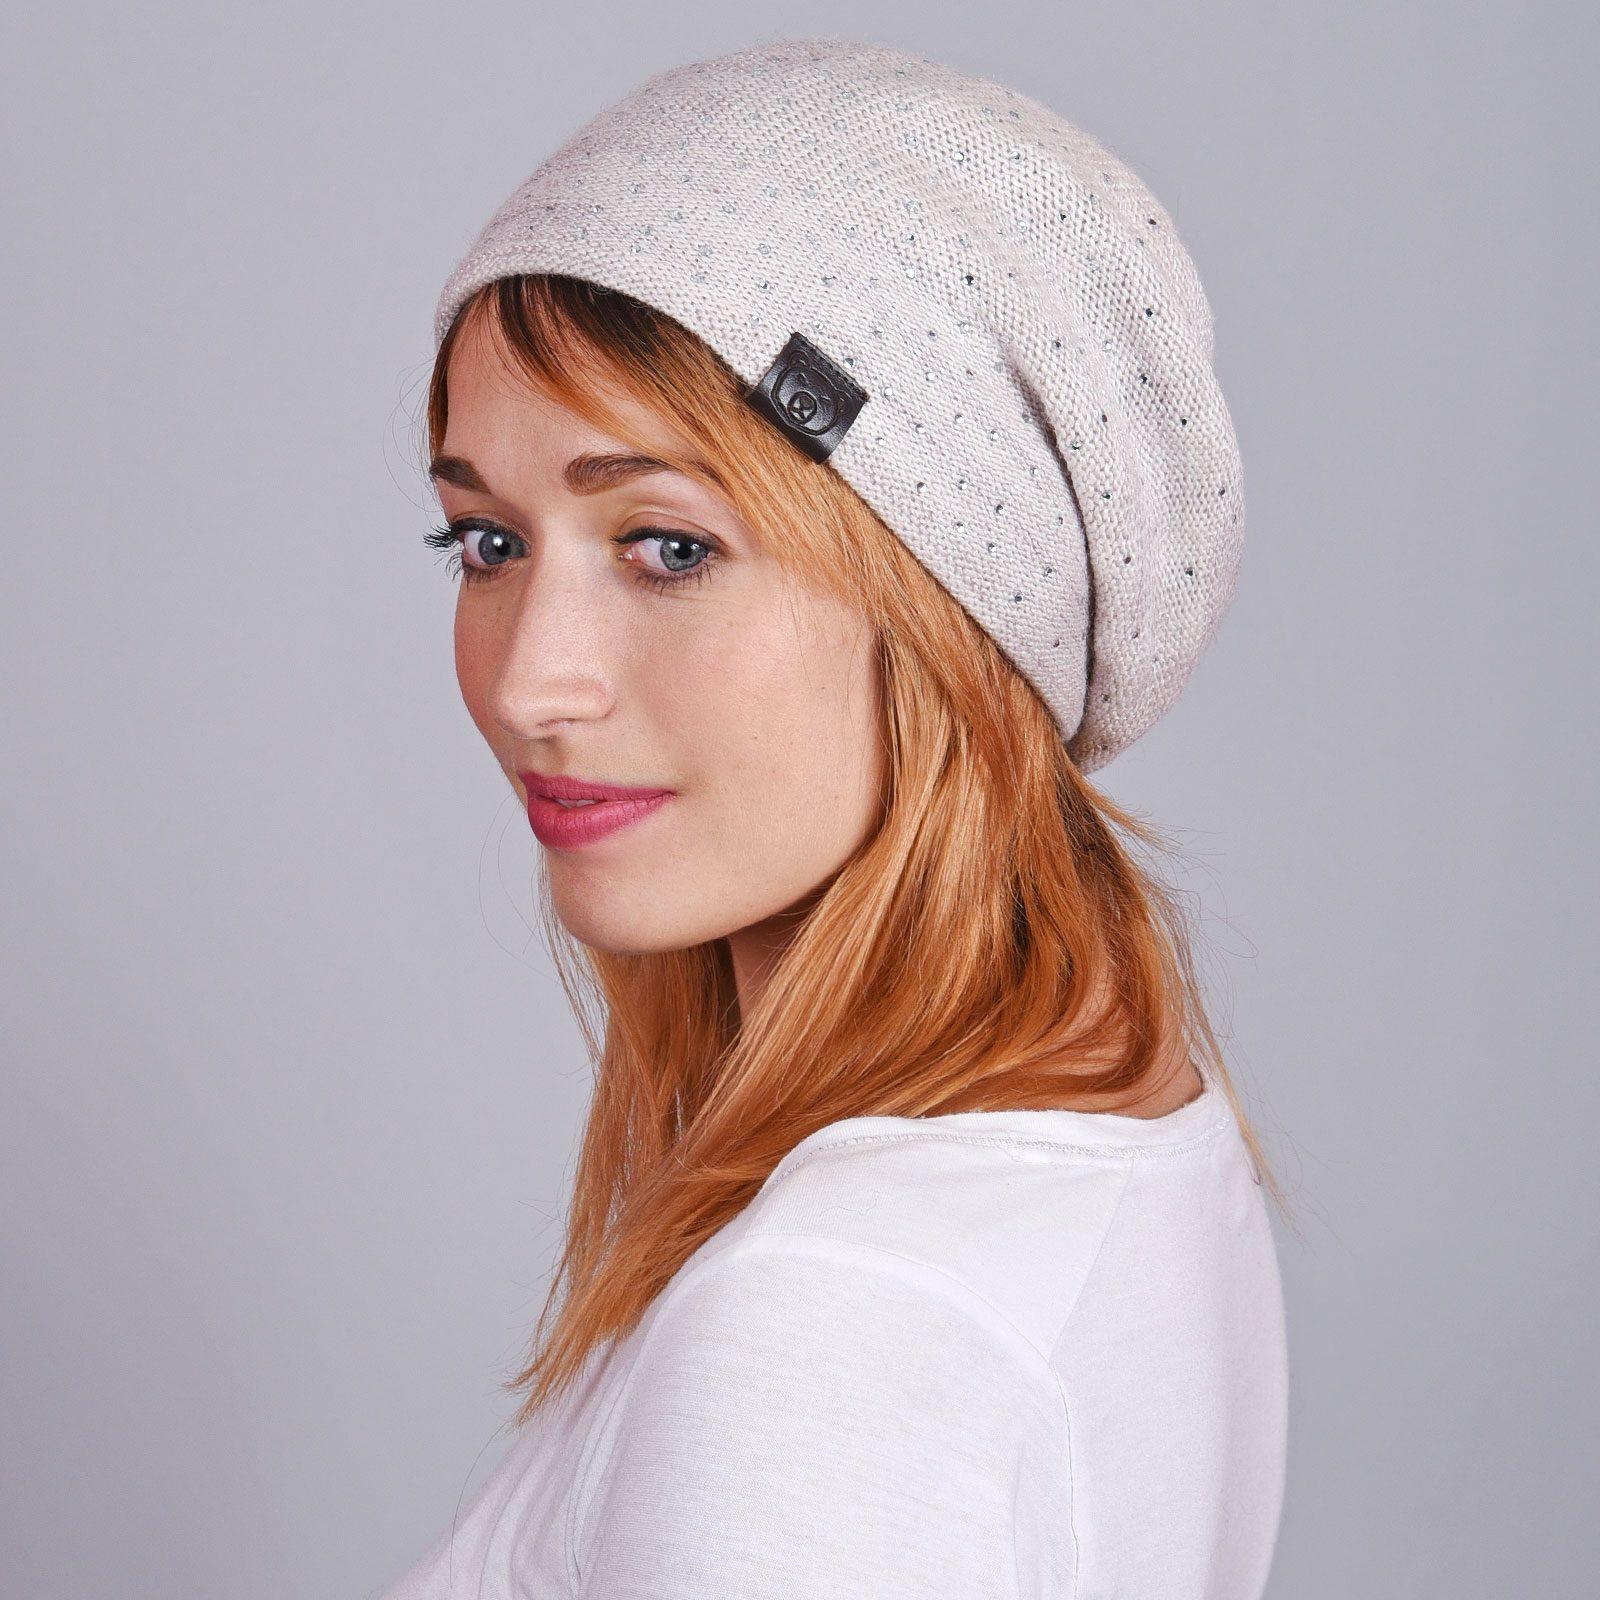 http://lookbook.allee-du-foulard.fr/wp-content/uploads/2018/11/CP-01064-VF16-1-bonnet-femme-inserts-brillants-blanc-1600x1600.jpg